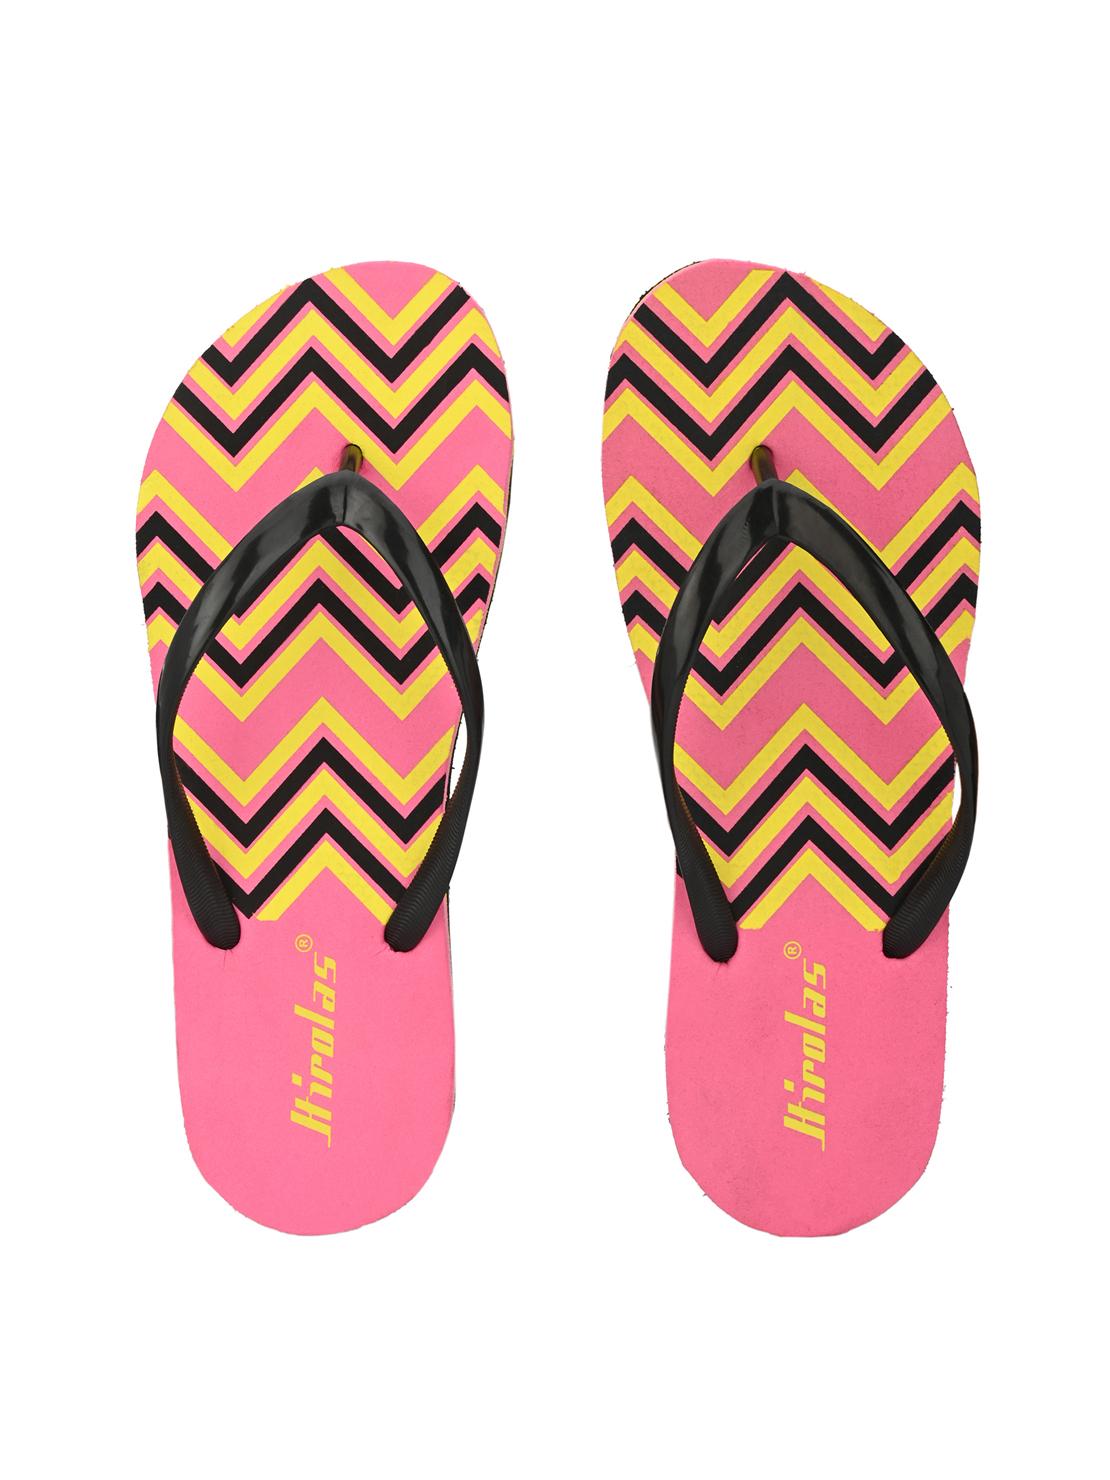 Hirolas | Hirolas® printed Flip Flop  Slippers for Women - Pink/Yellow